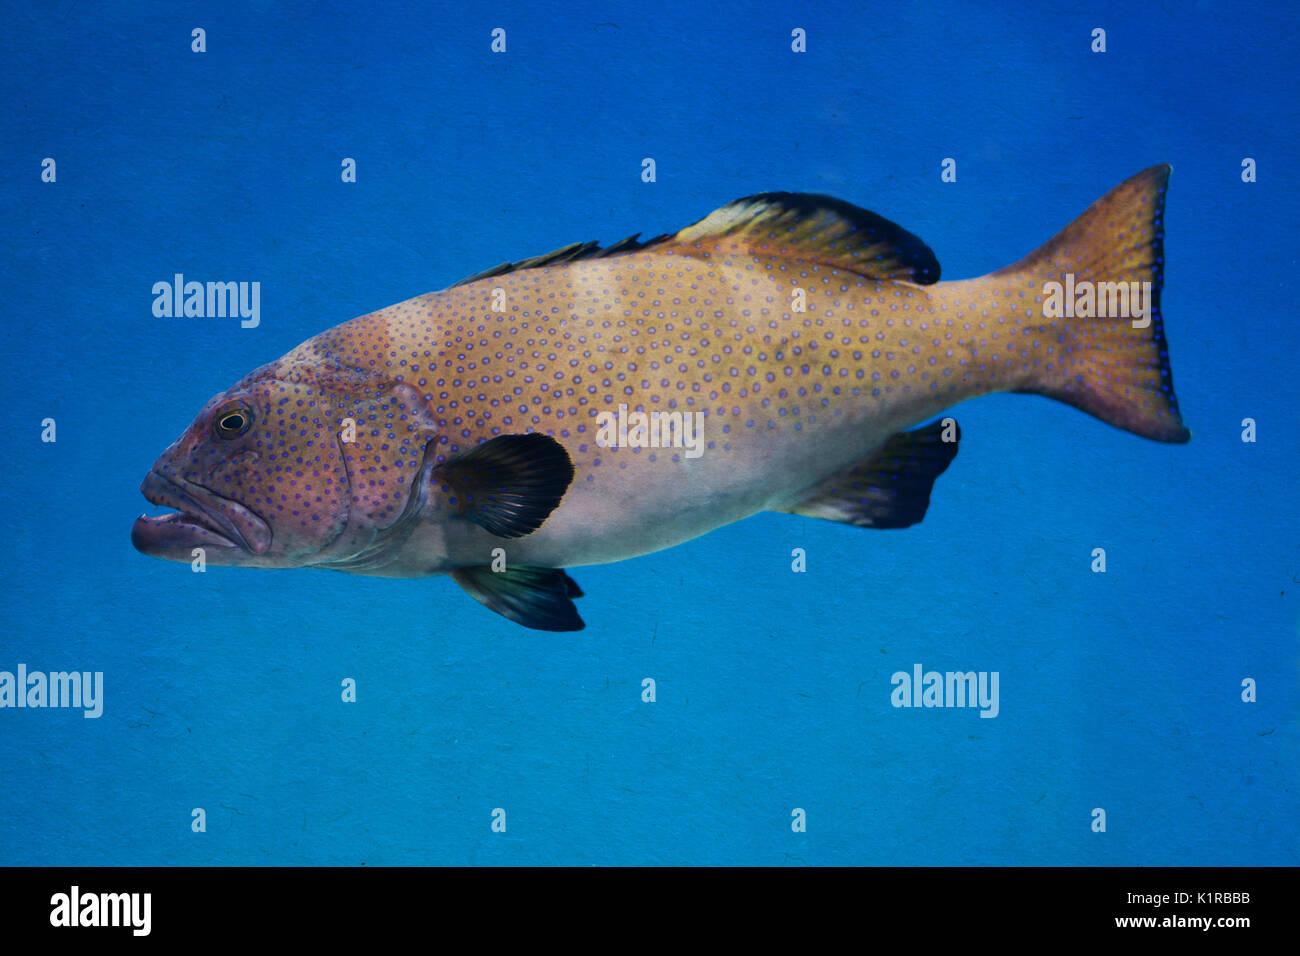 Fish gills water stock photos fish gills water stock for Big fish in the ocean